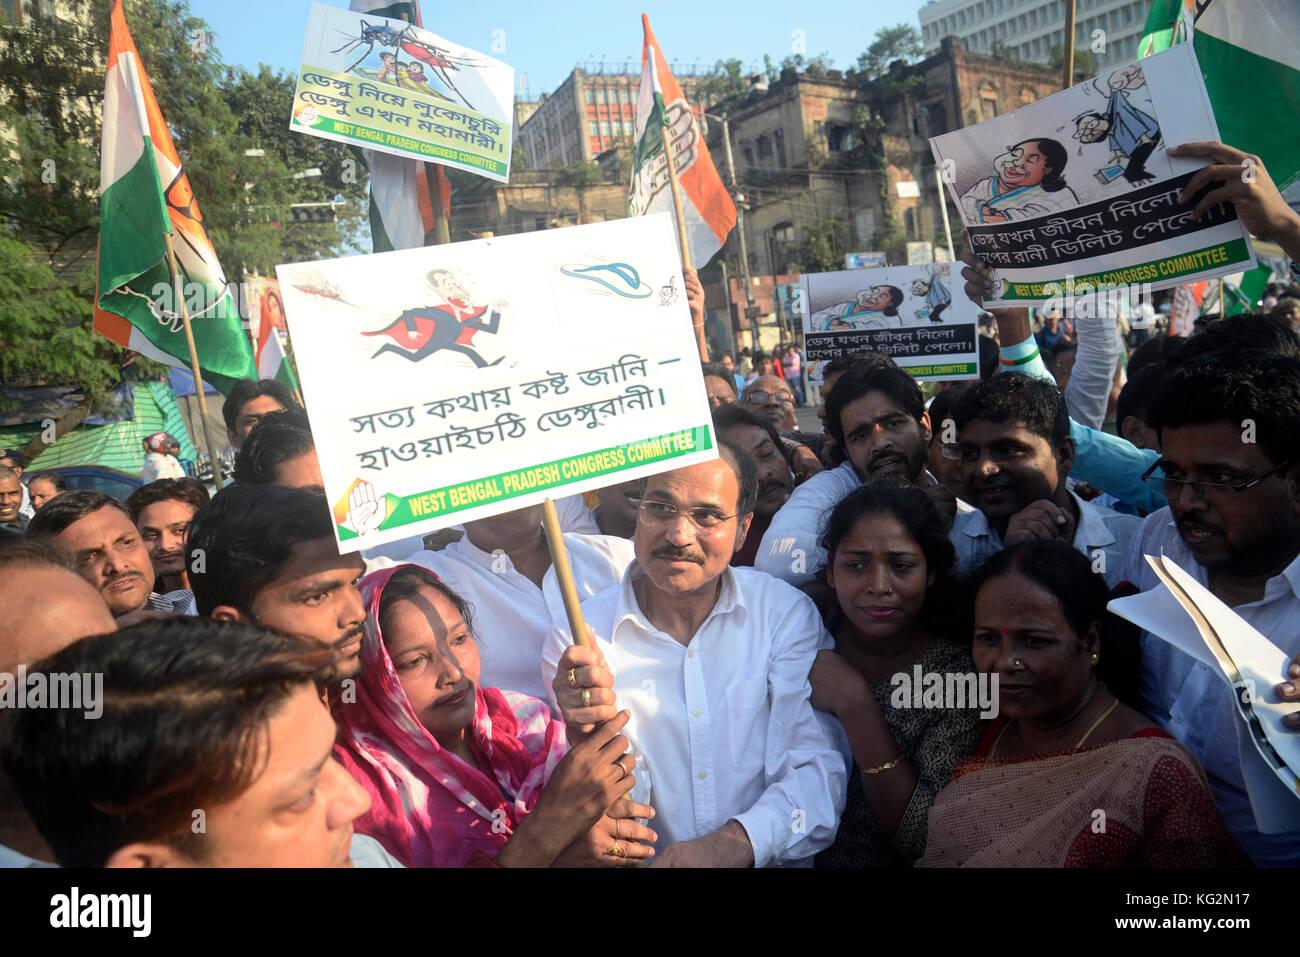 West Bengal Pradesh Congress Committee President, Adhir